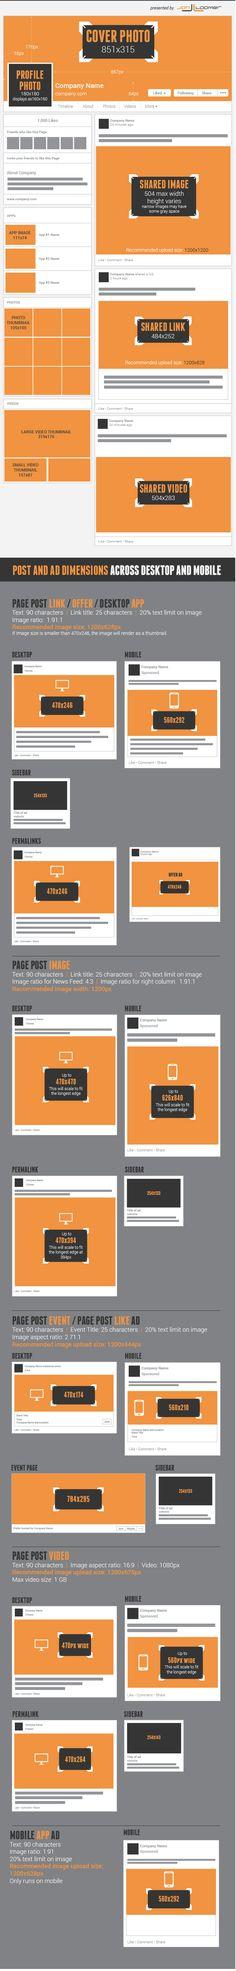 Dimensioni immagini Facebook